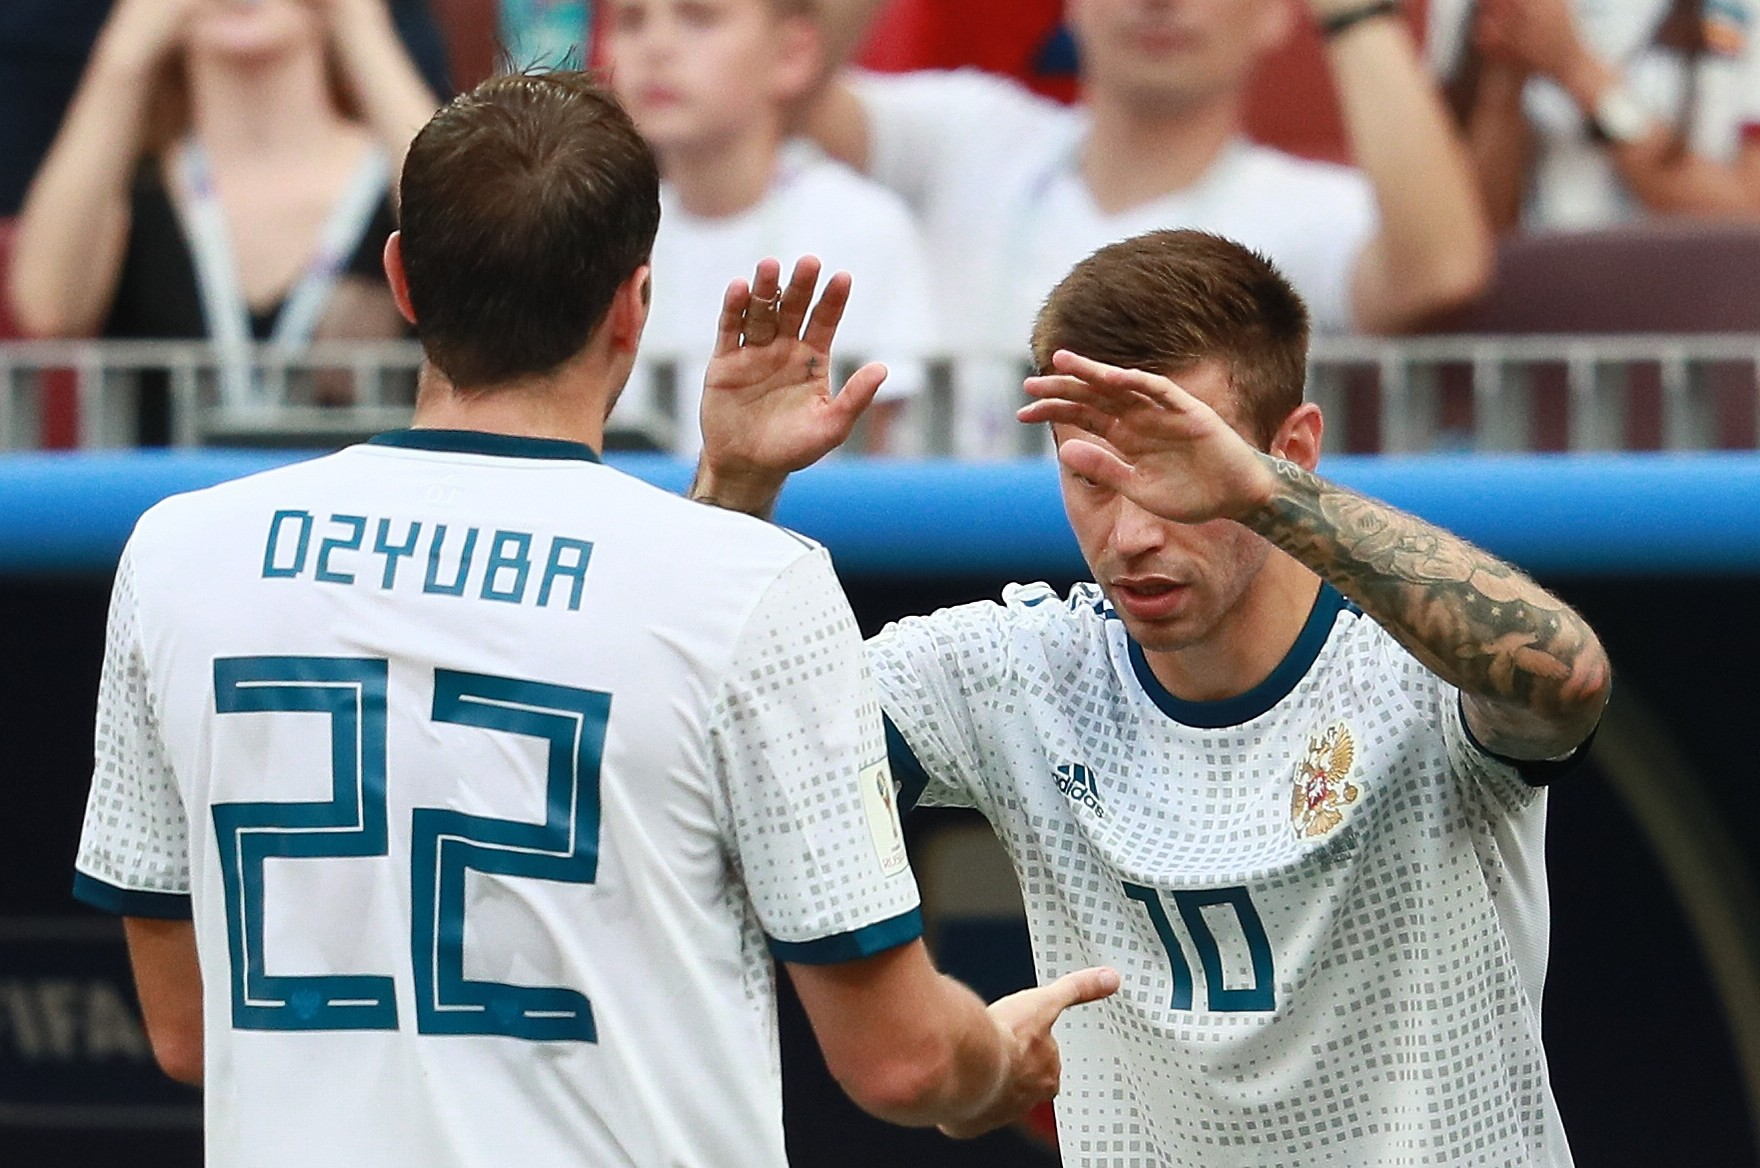 Фото: РИА Новости/Антон Денисов